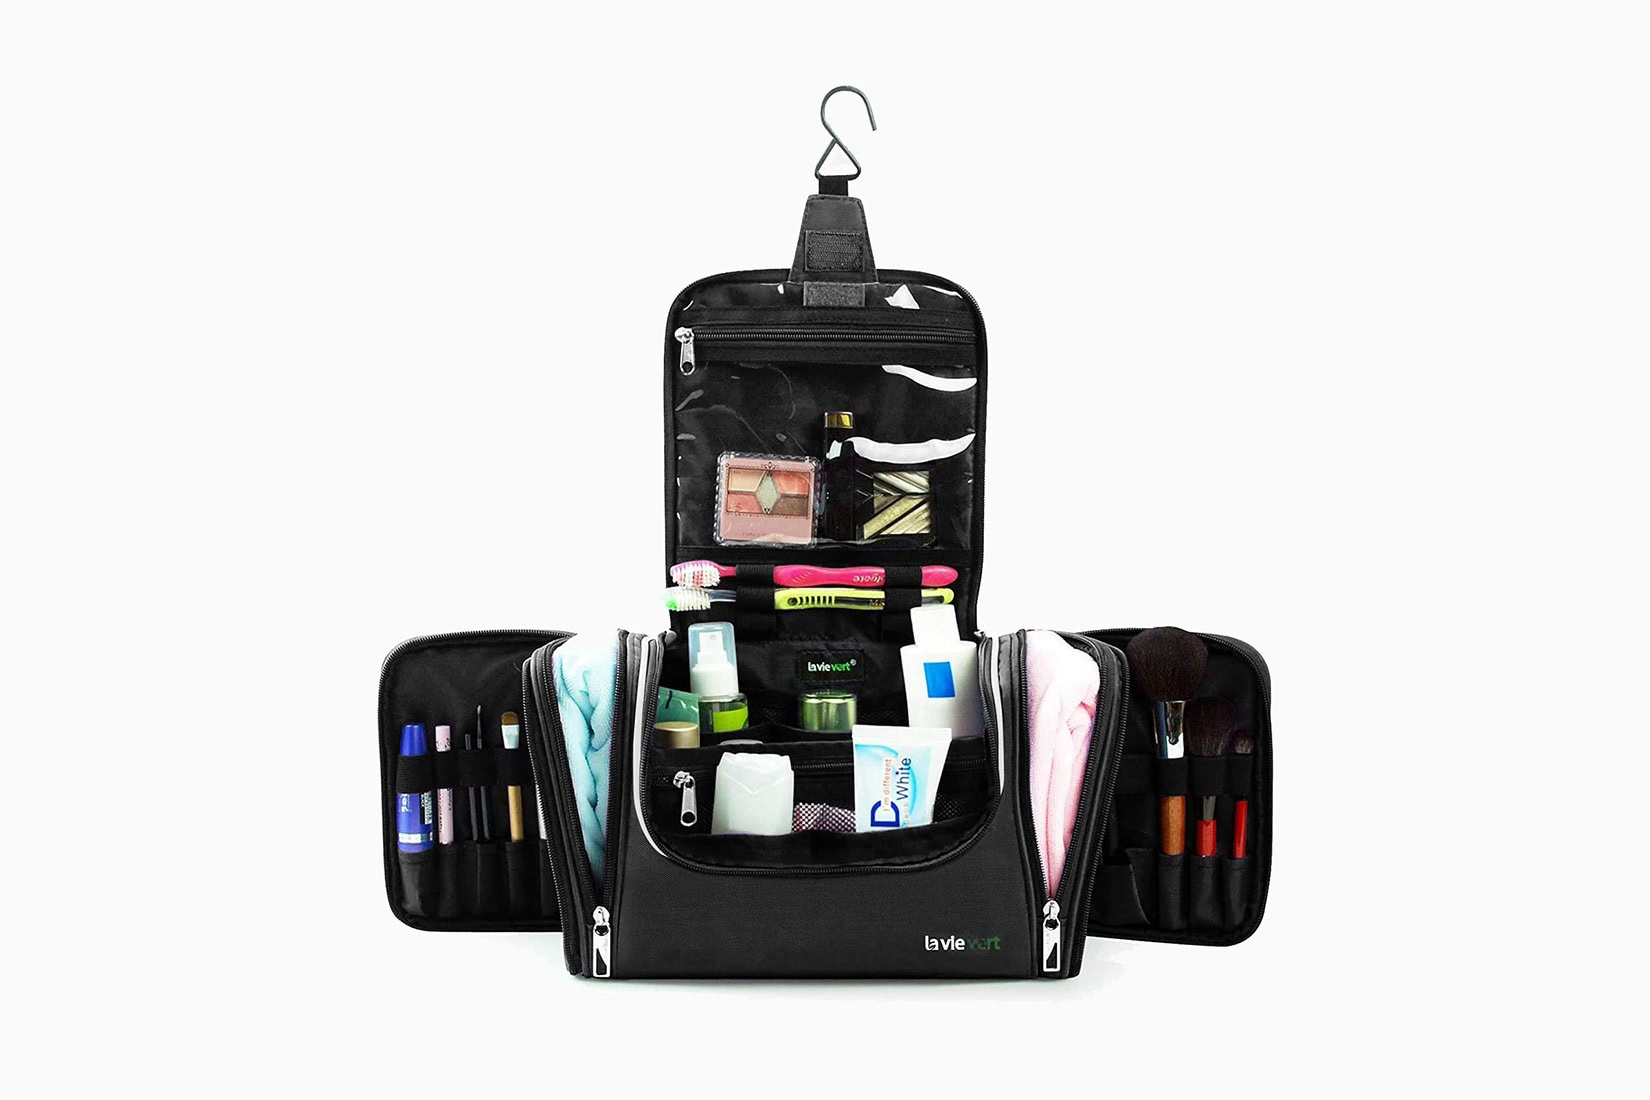 best toiletry bag women travel case lavievert - Luxe Digital